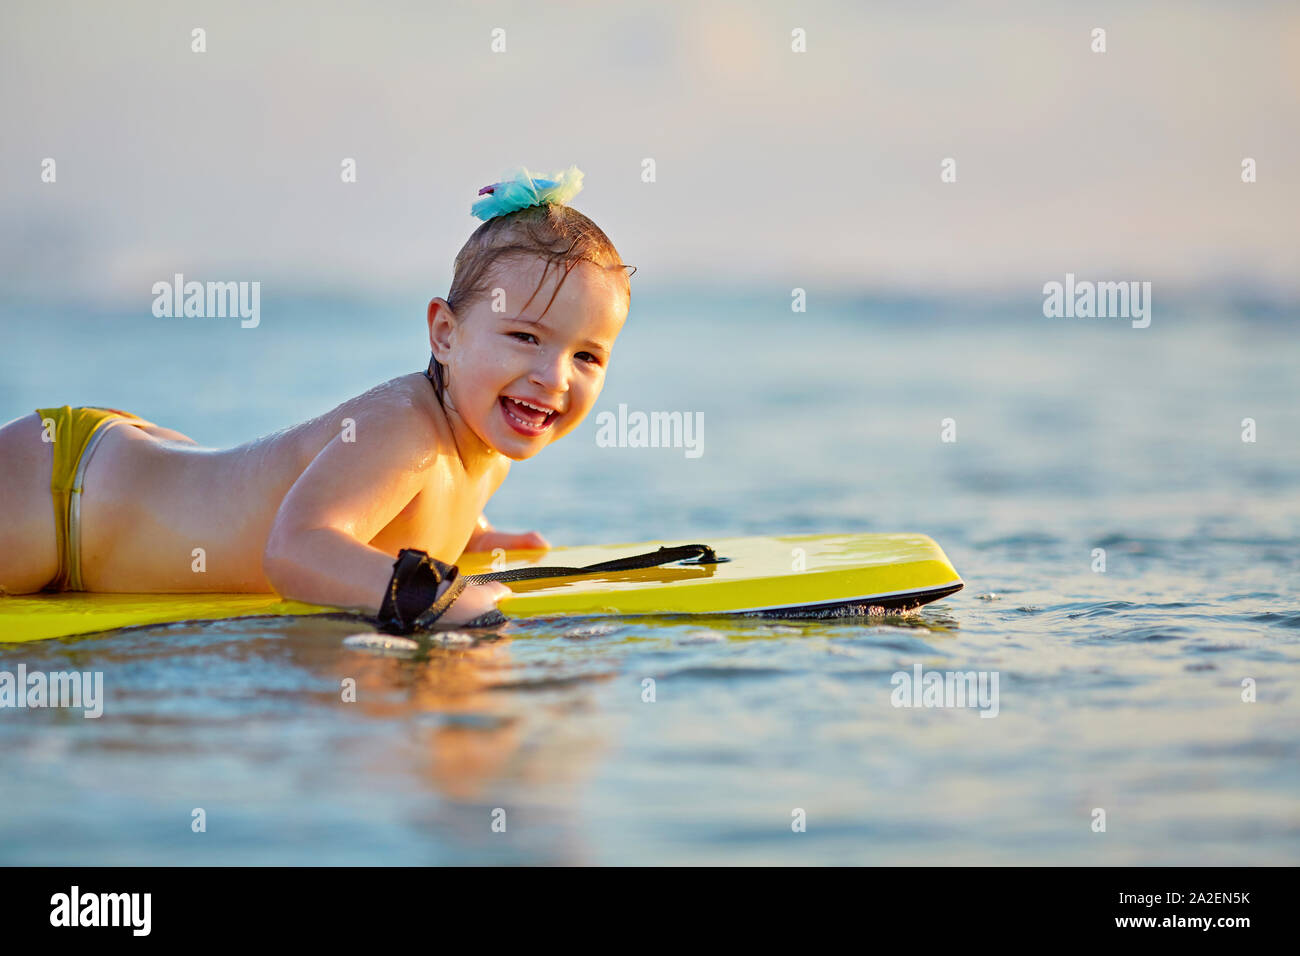 golden waves of wonderful sea splashing near adorable girl in swimsuit carrying yellow surfboard Stock Photo